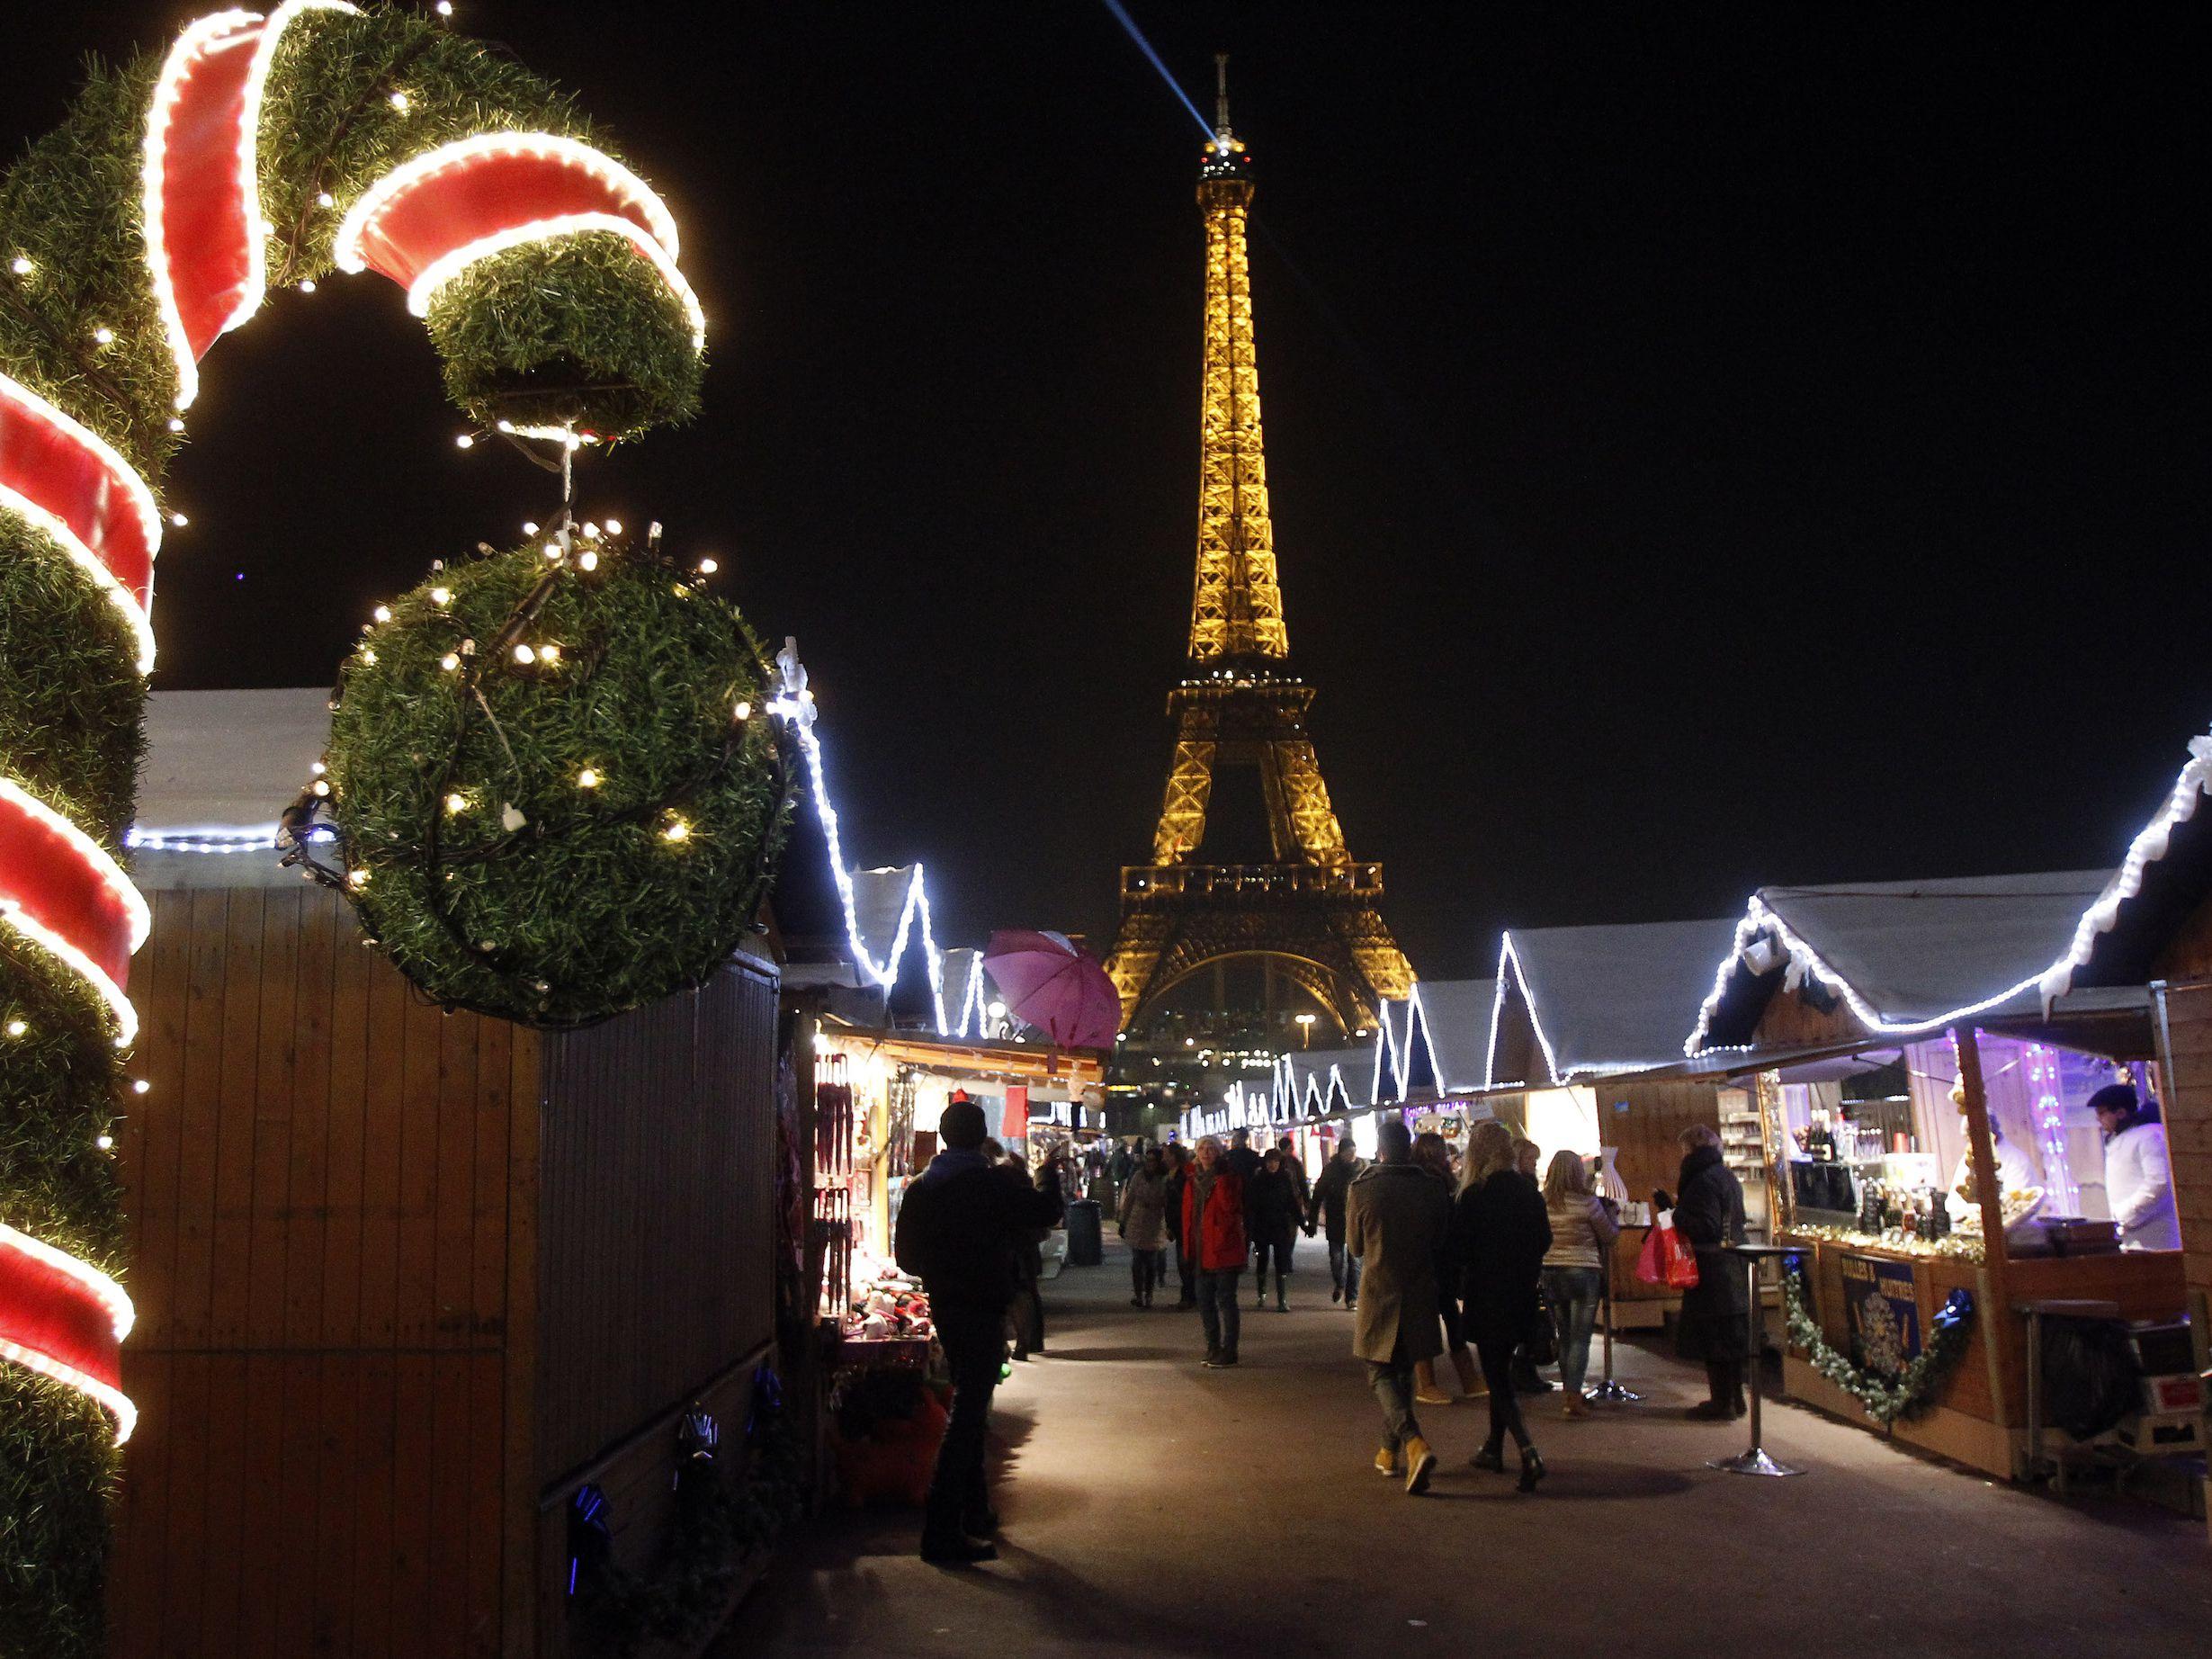 trocadero christmasmarket chesnot tyimages 56a404ab5f9b58b7d0d4f3aa